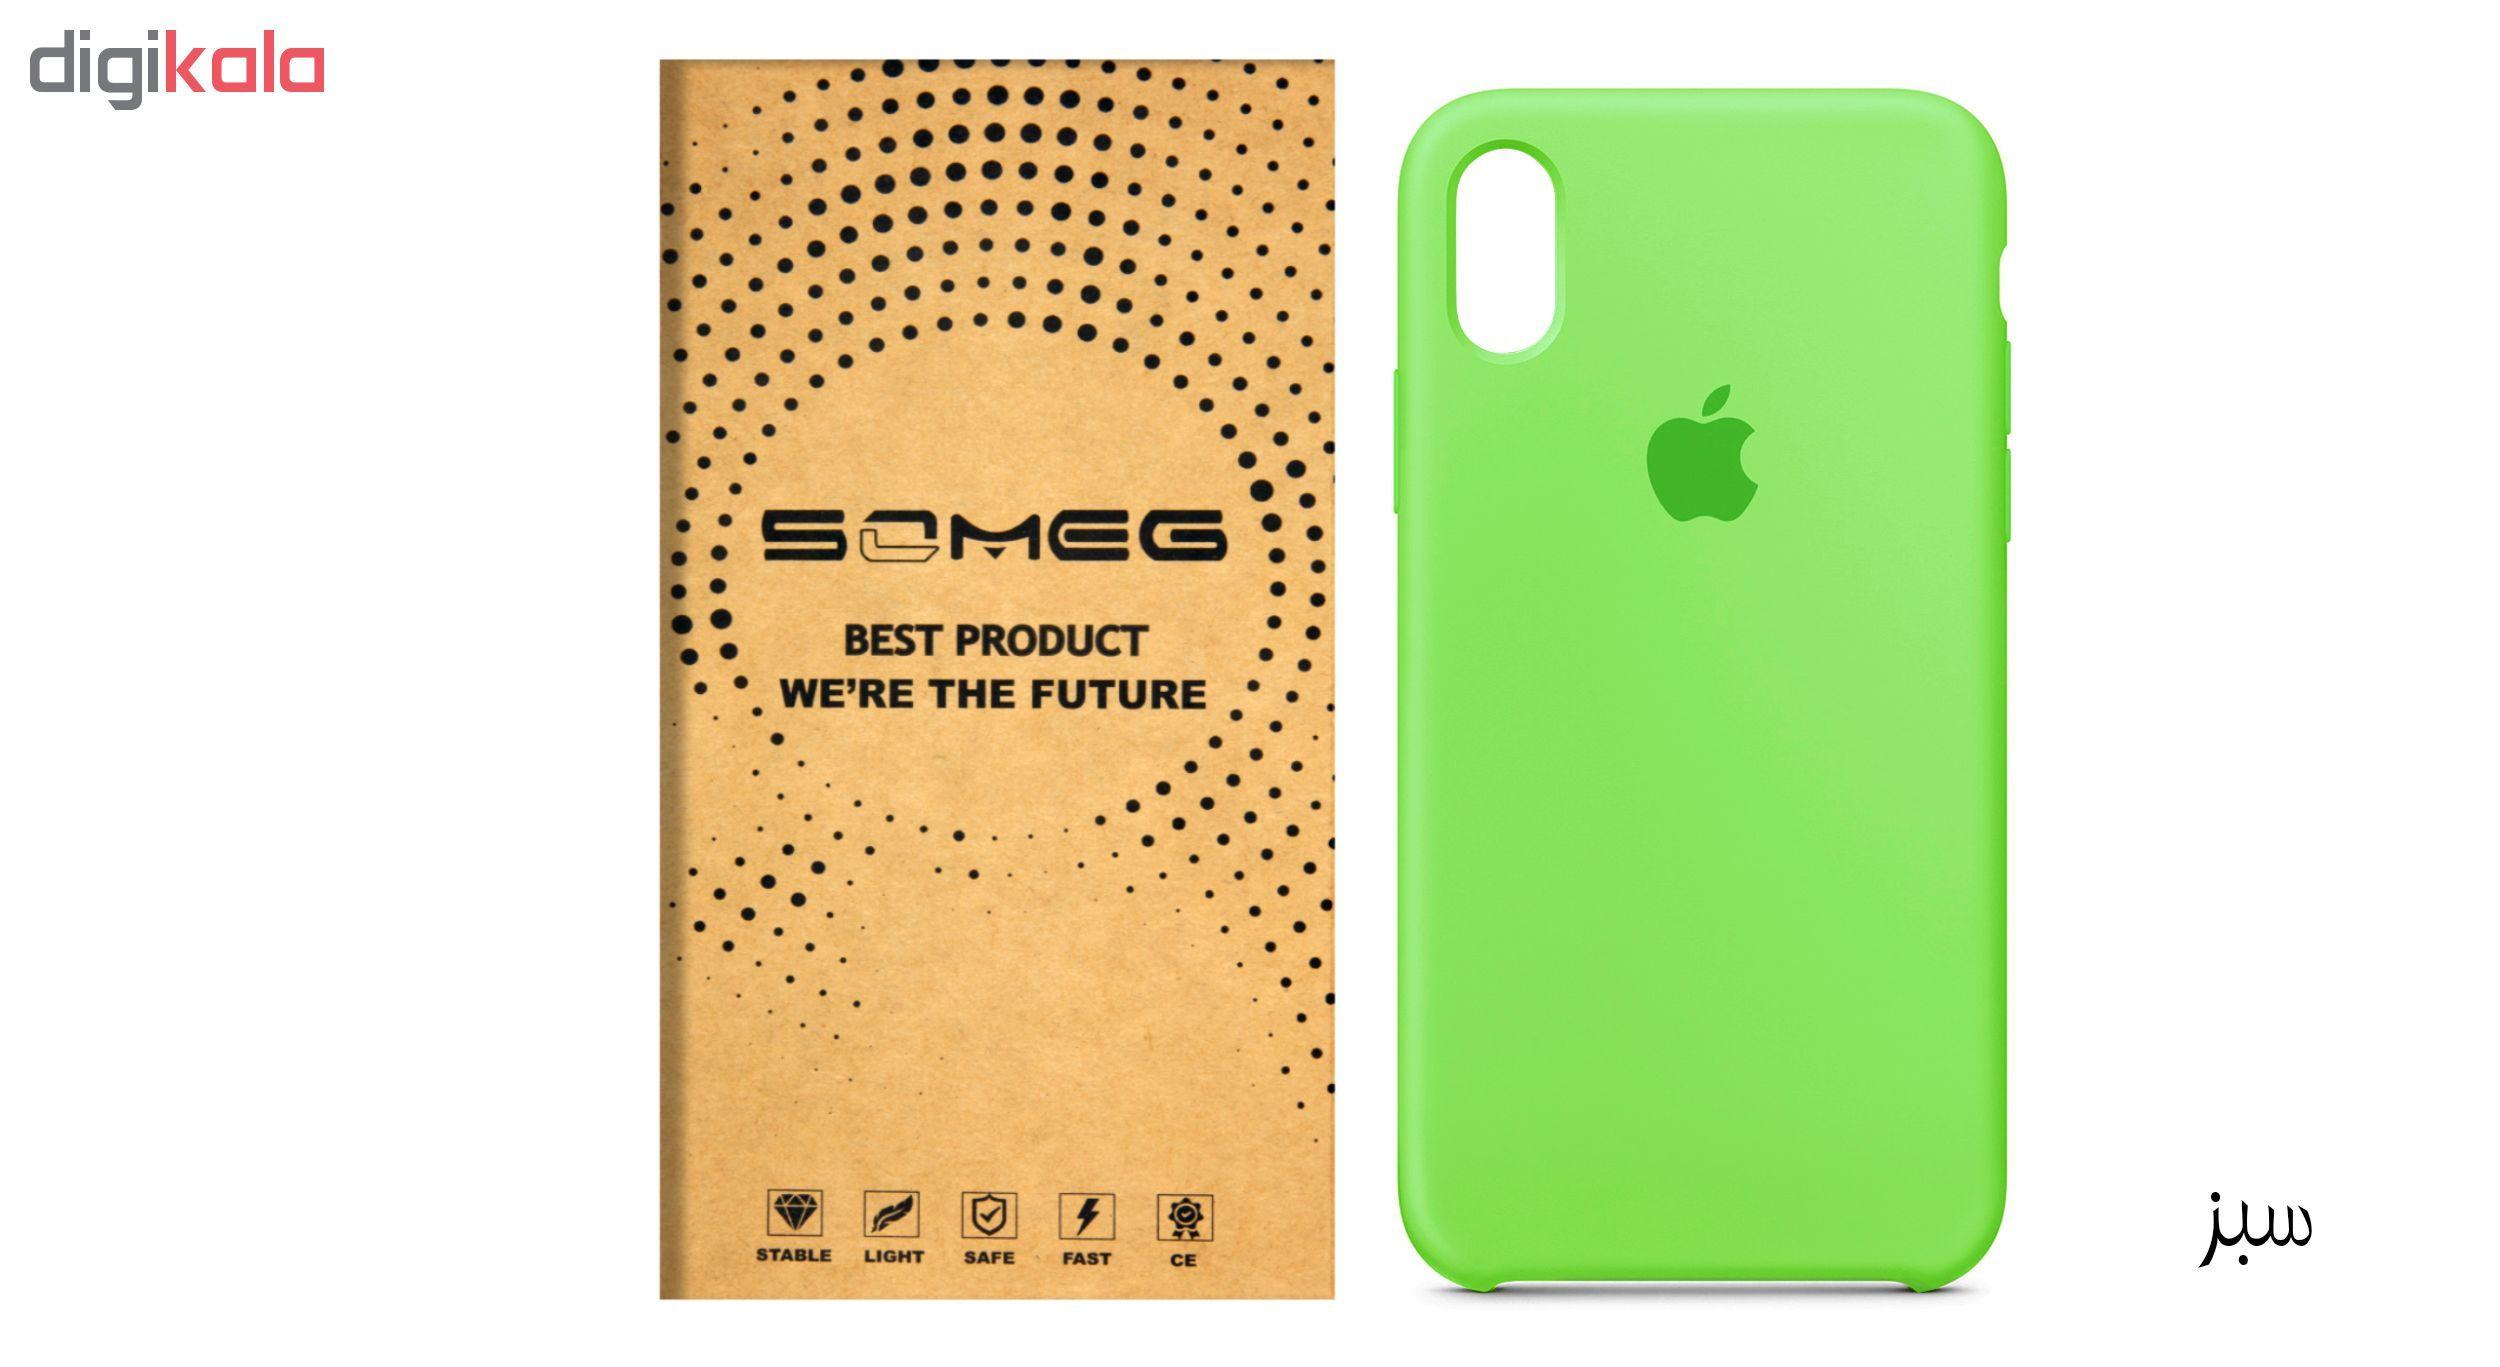 کاور سومگ مدل SIC مناسب برای گوشی موبایل اپل iPhone X  main 1 7